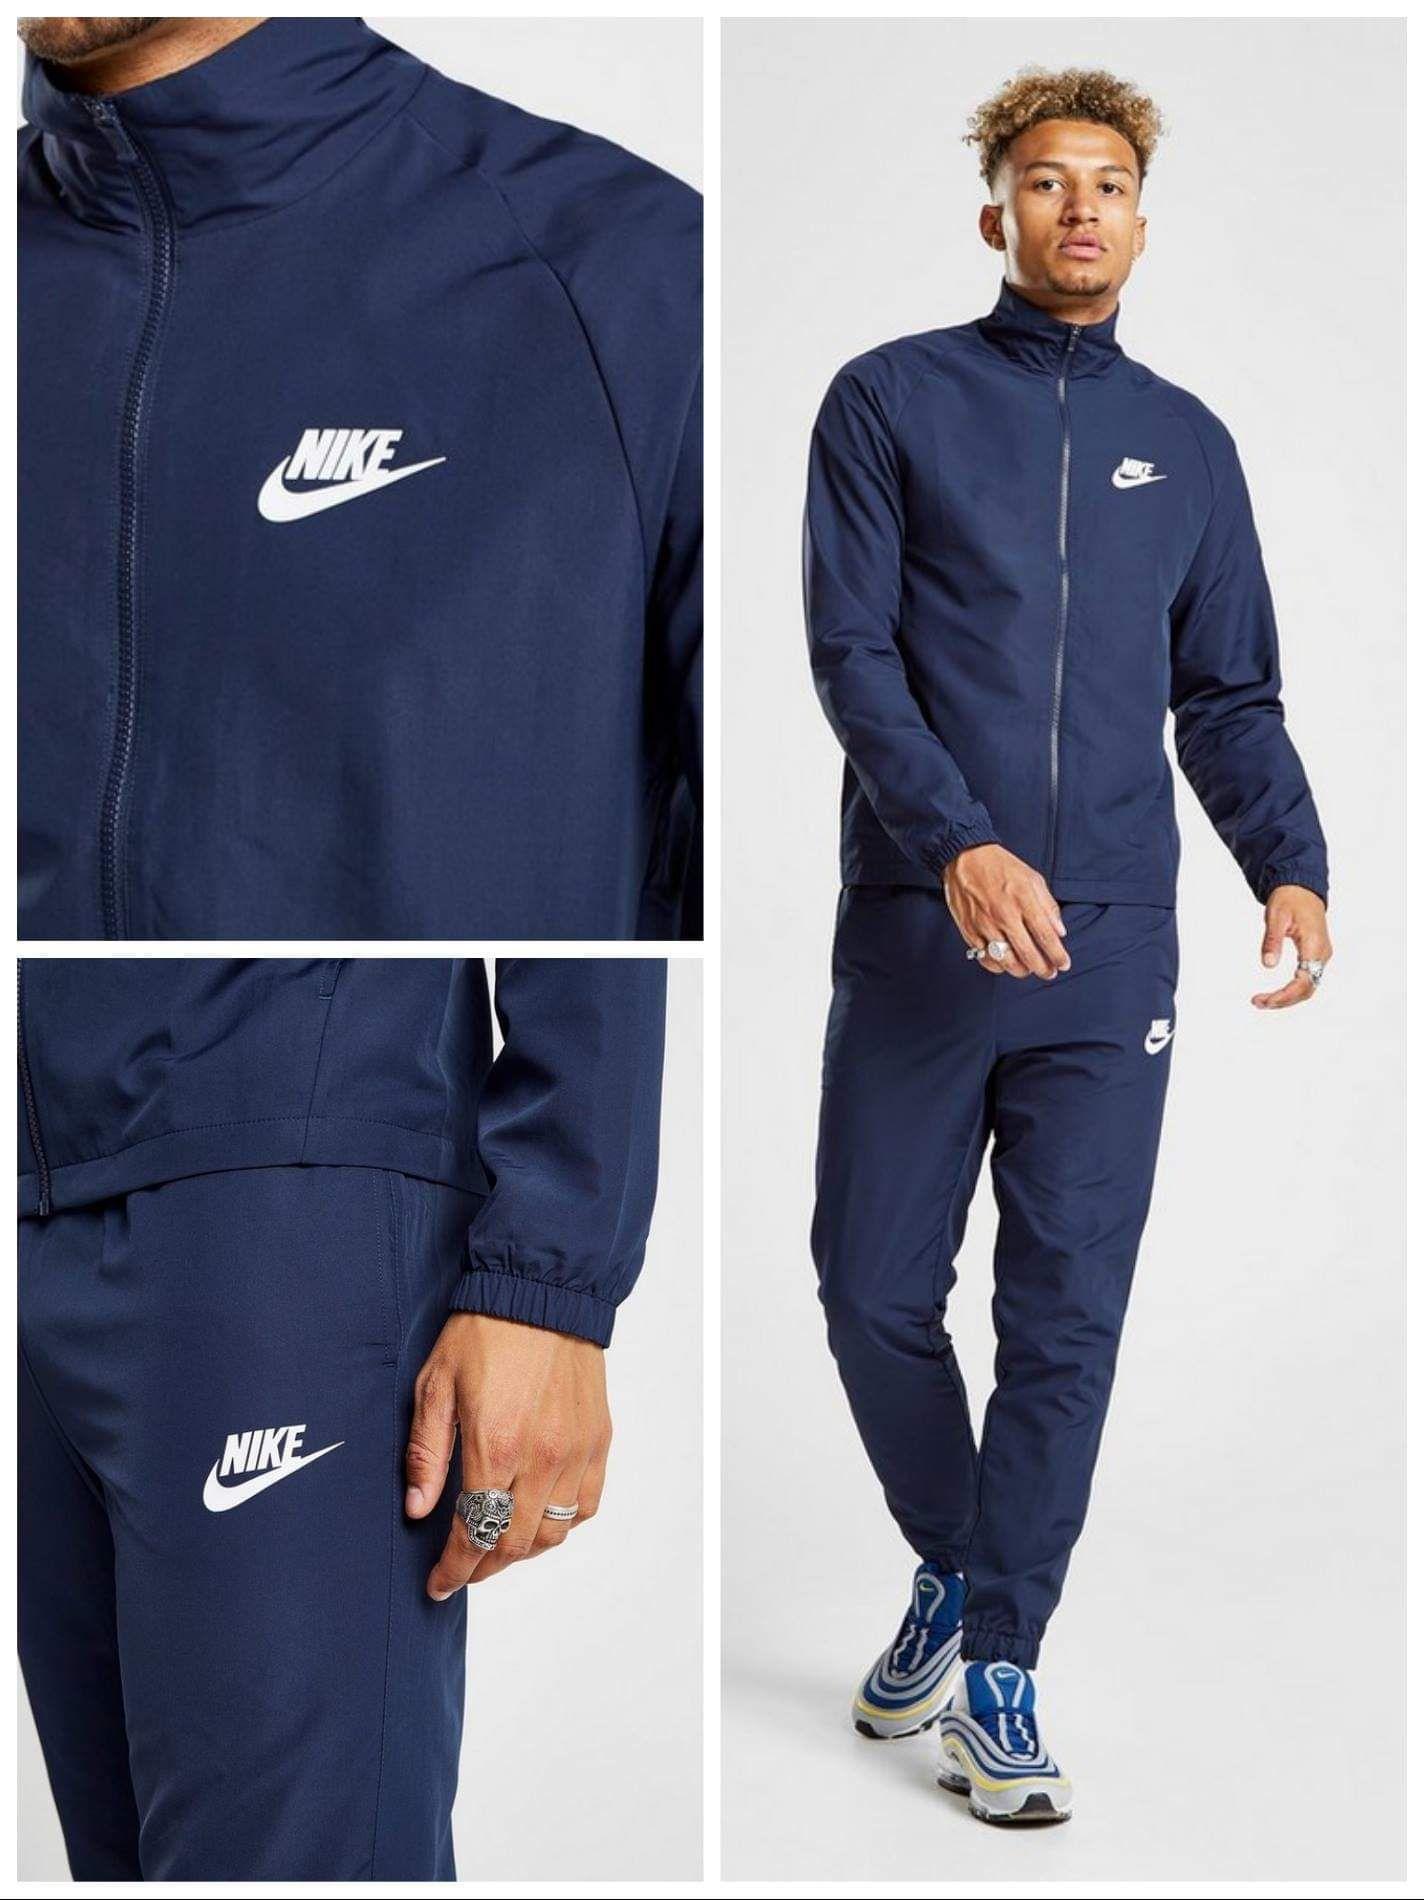 0e0938373e40 Nike Season 2 Woven Tracksuit - mydealz.de